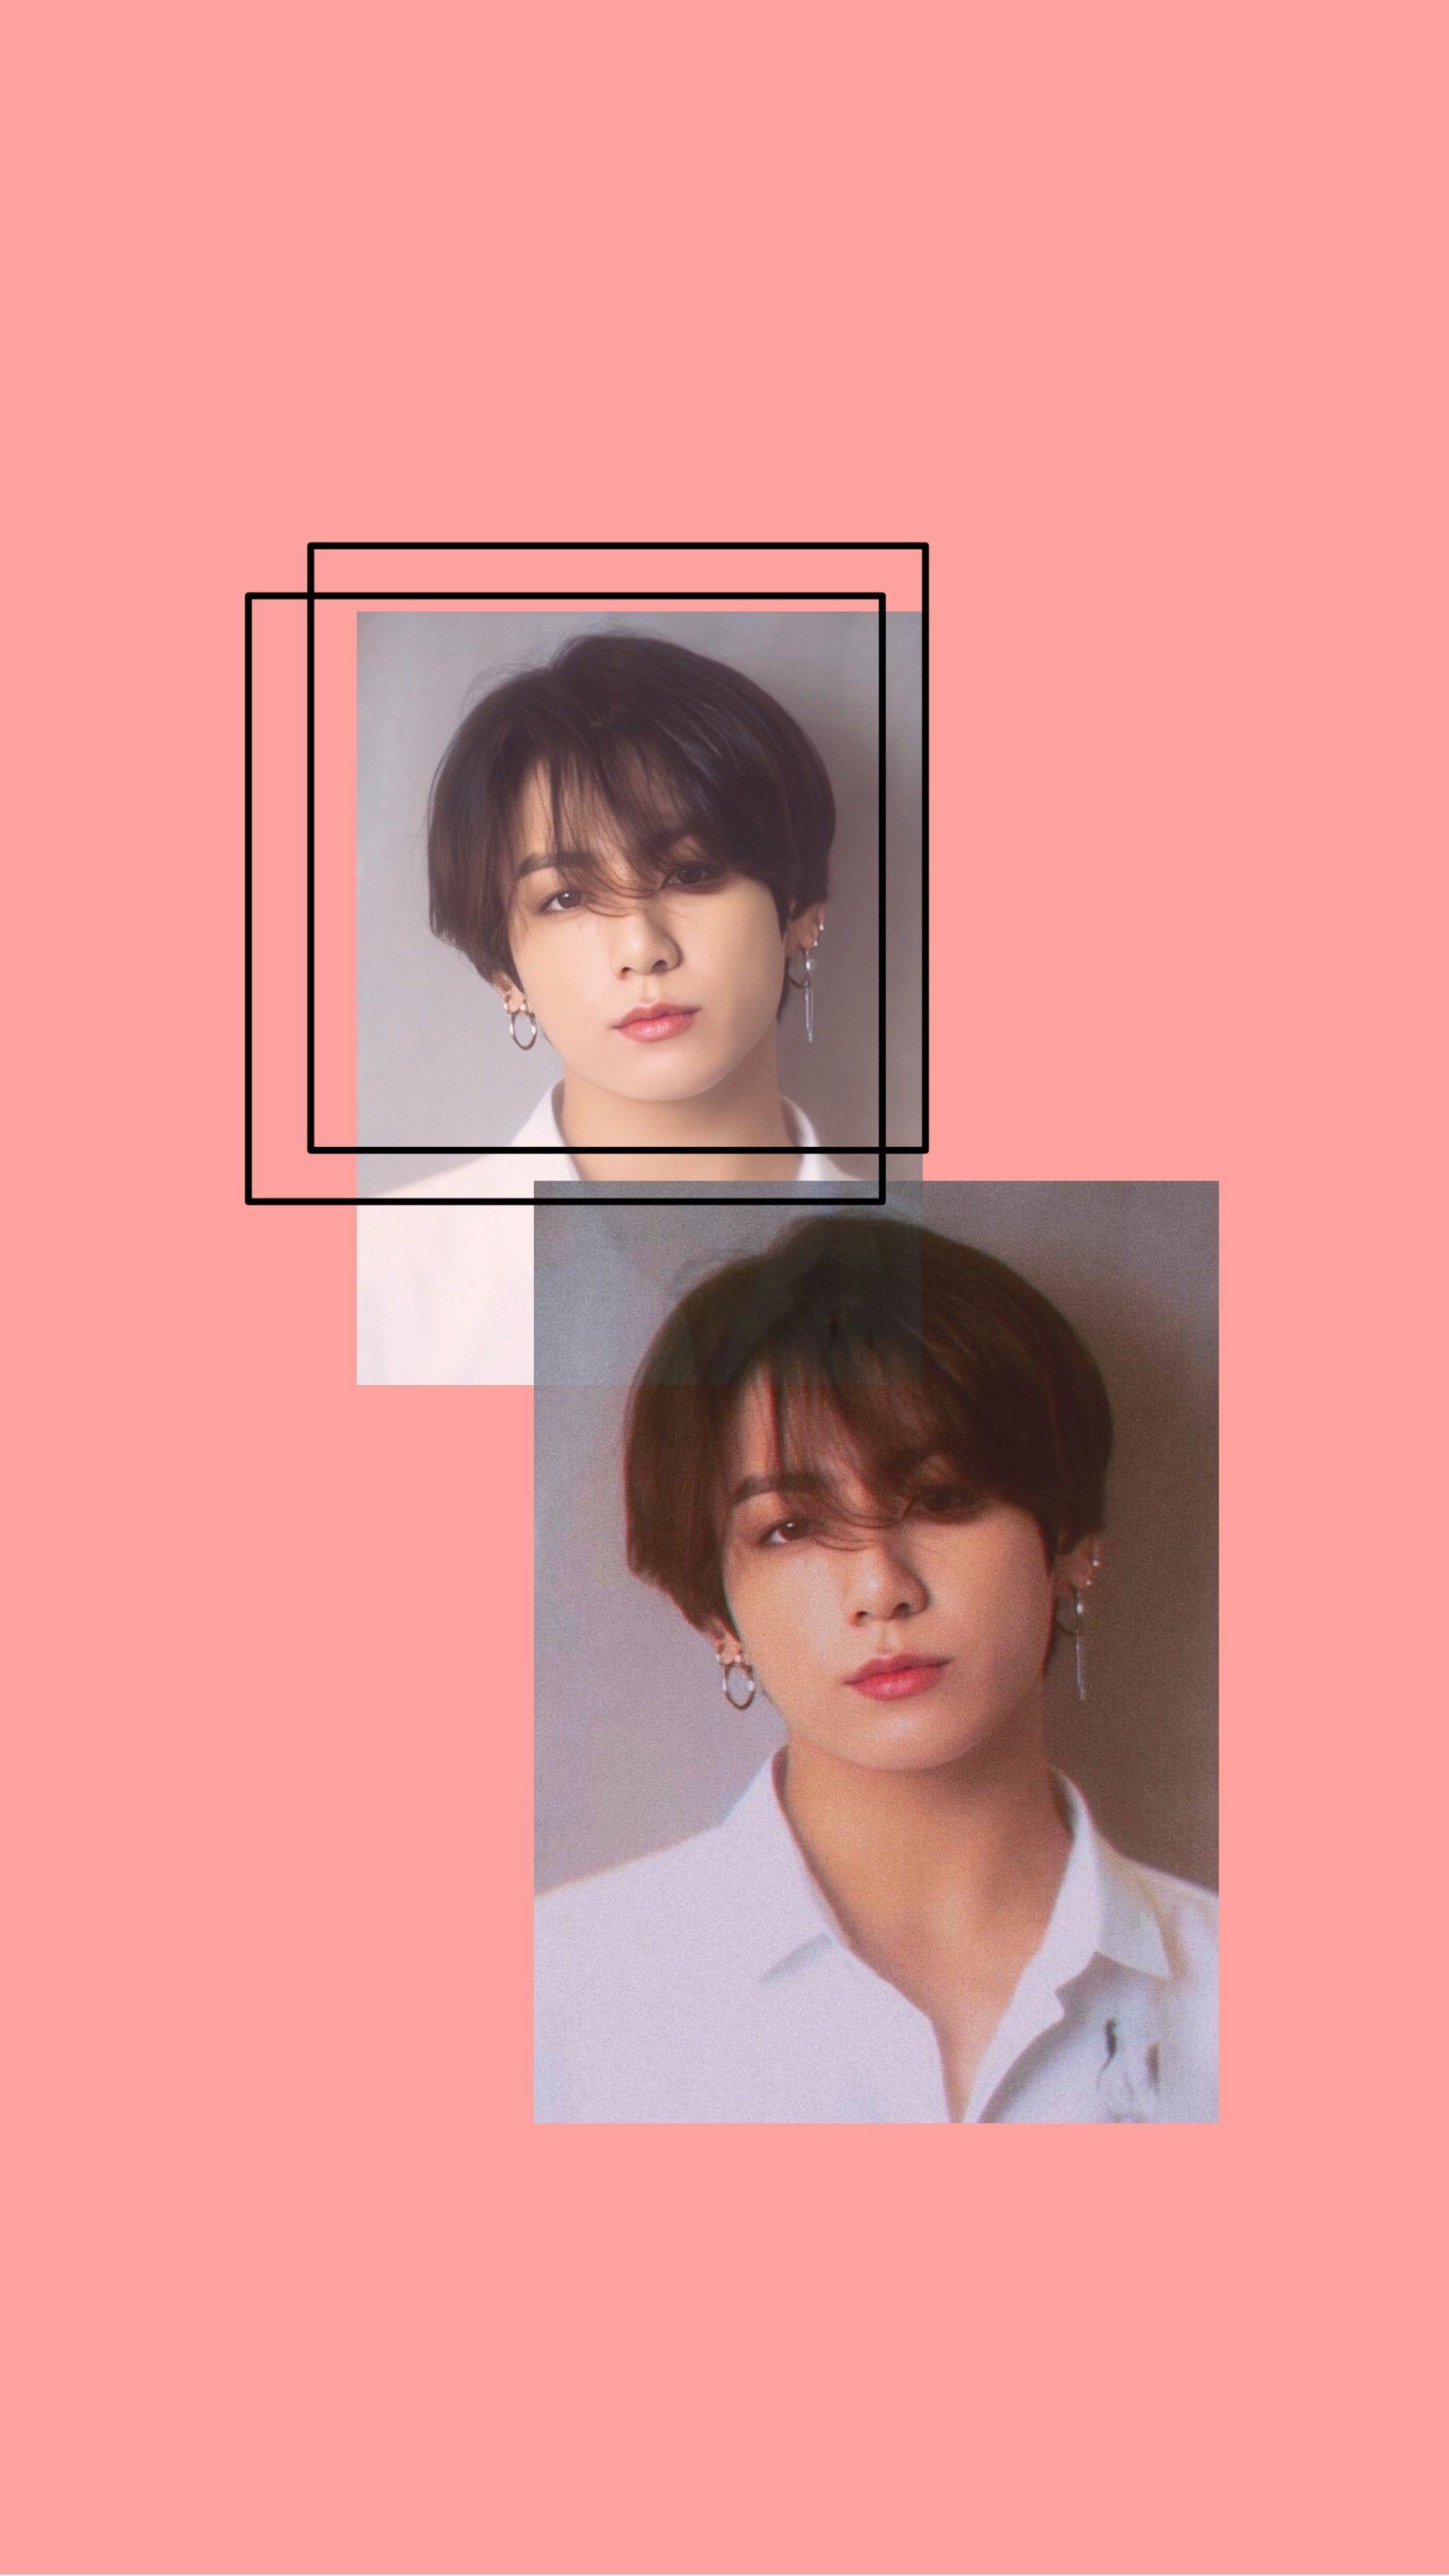 Free Jungkook Bts Wallpaper Bts Walpaper Kpop Wallpaper